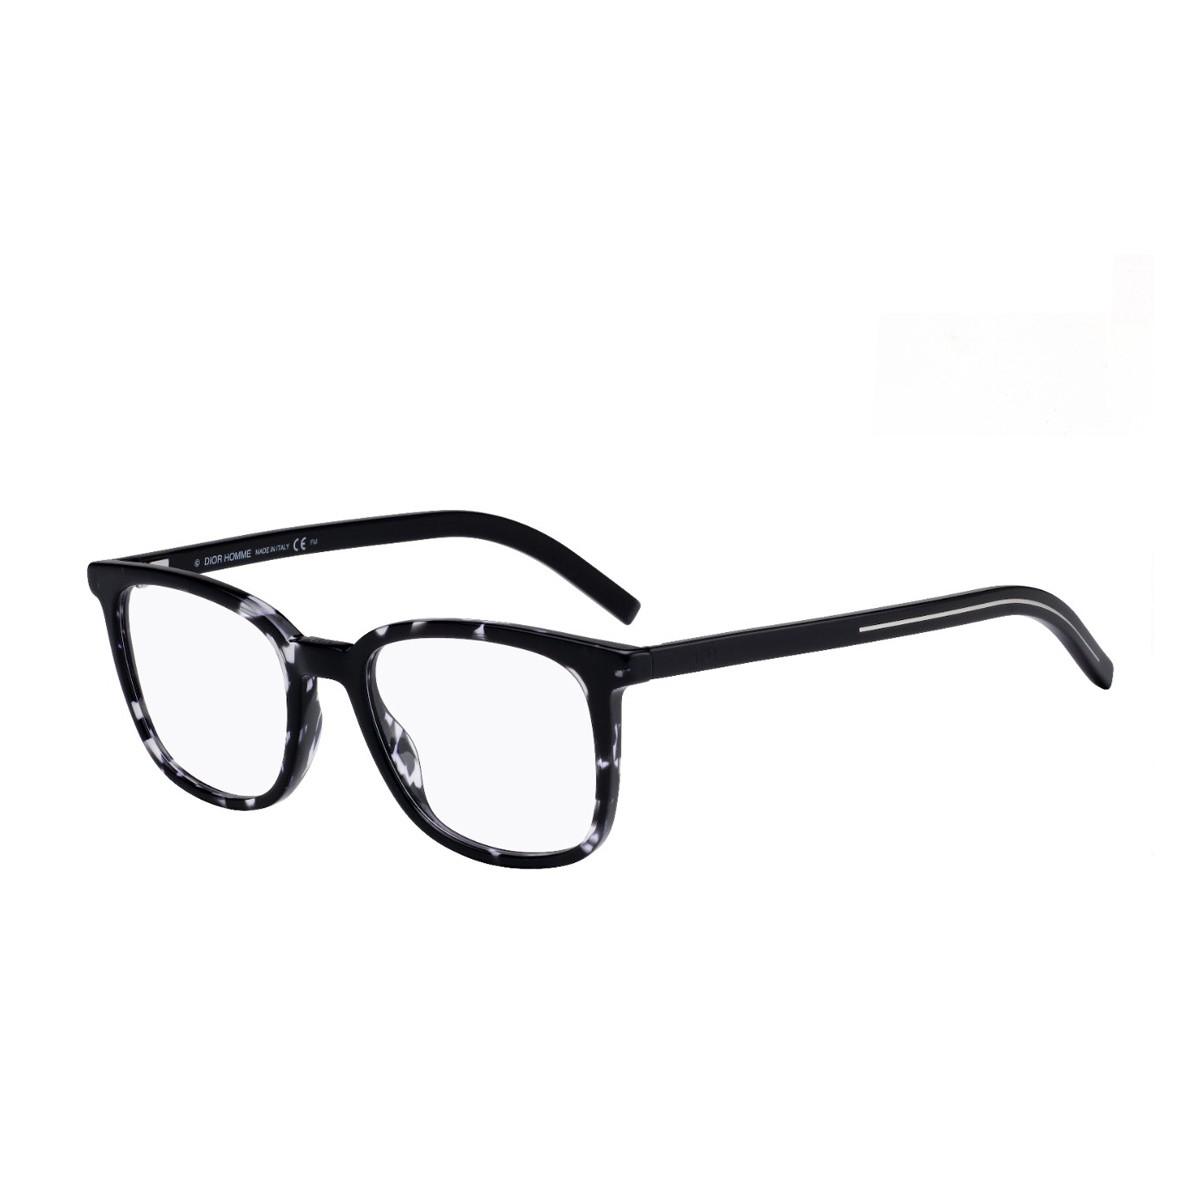 Dior Blacktie 252   Occhiali da vista Uomo